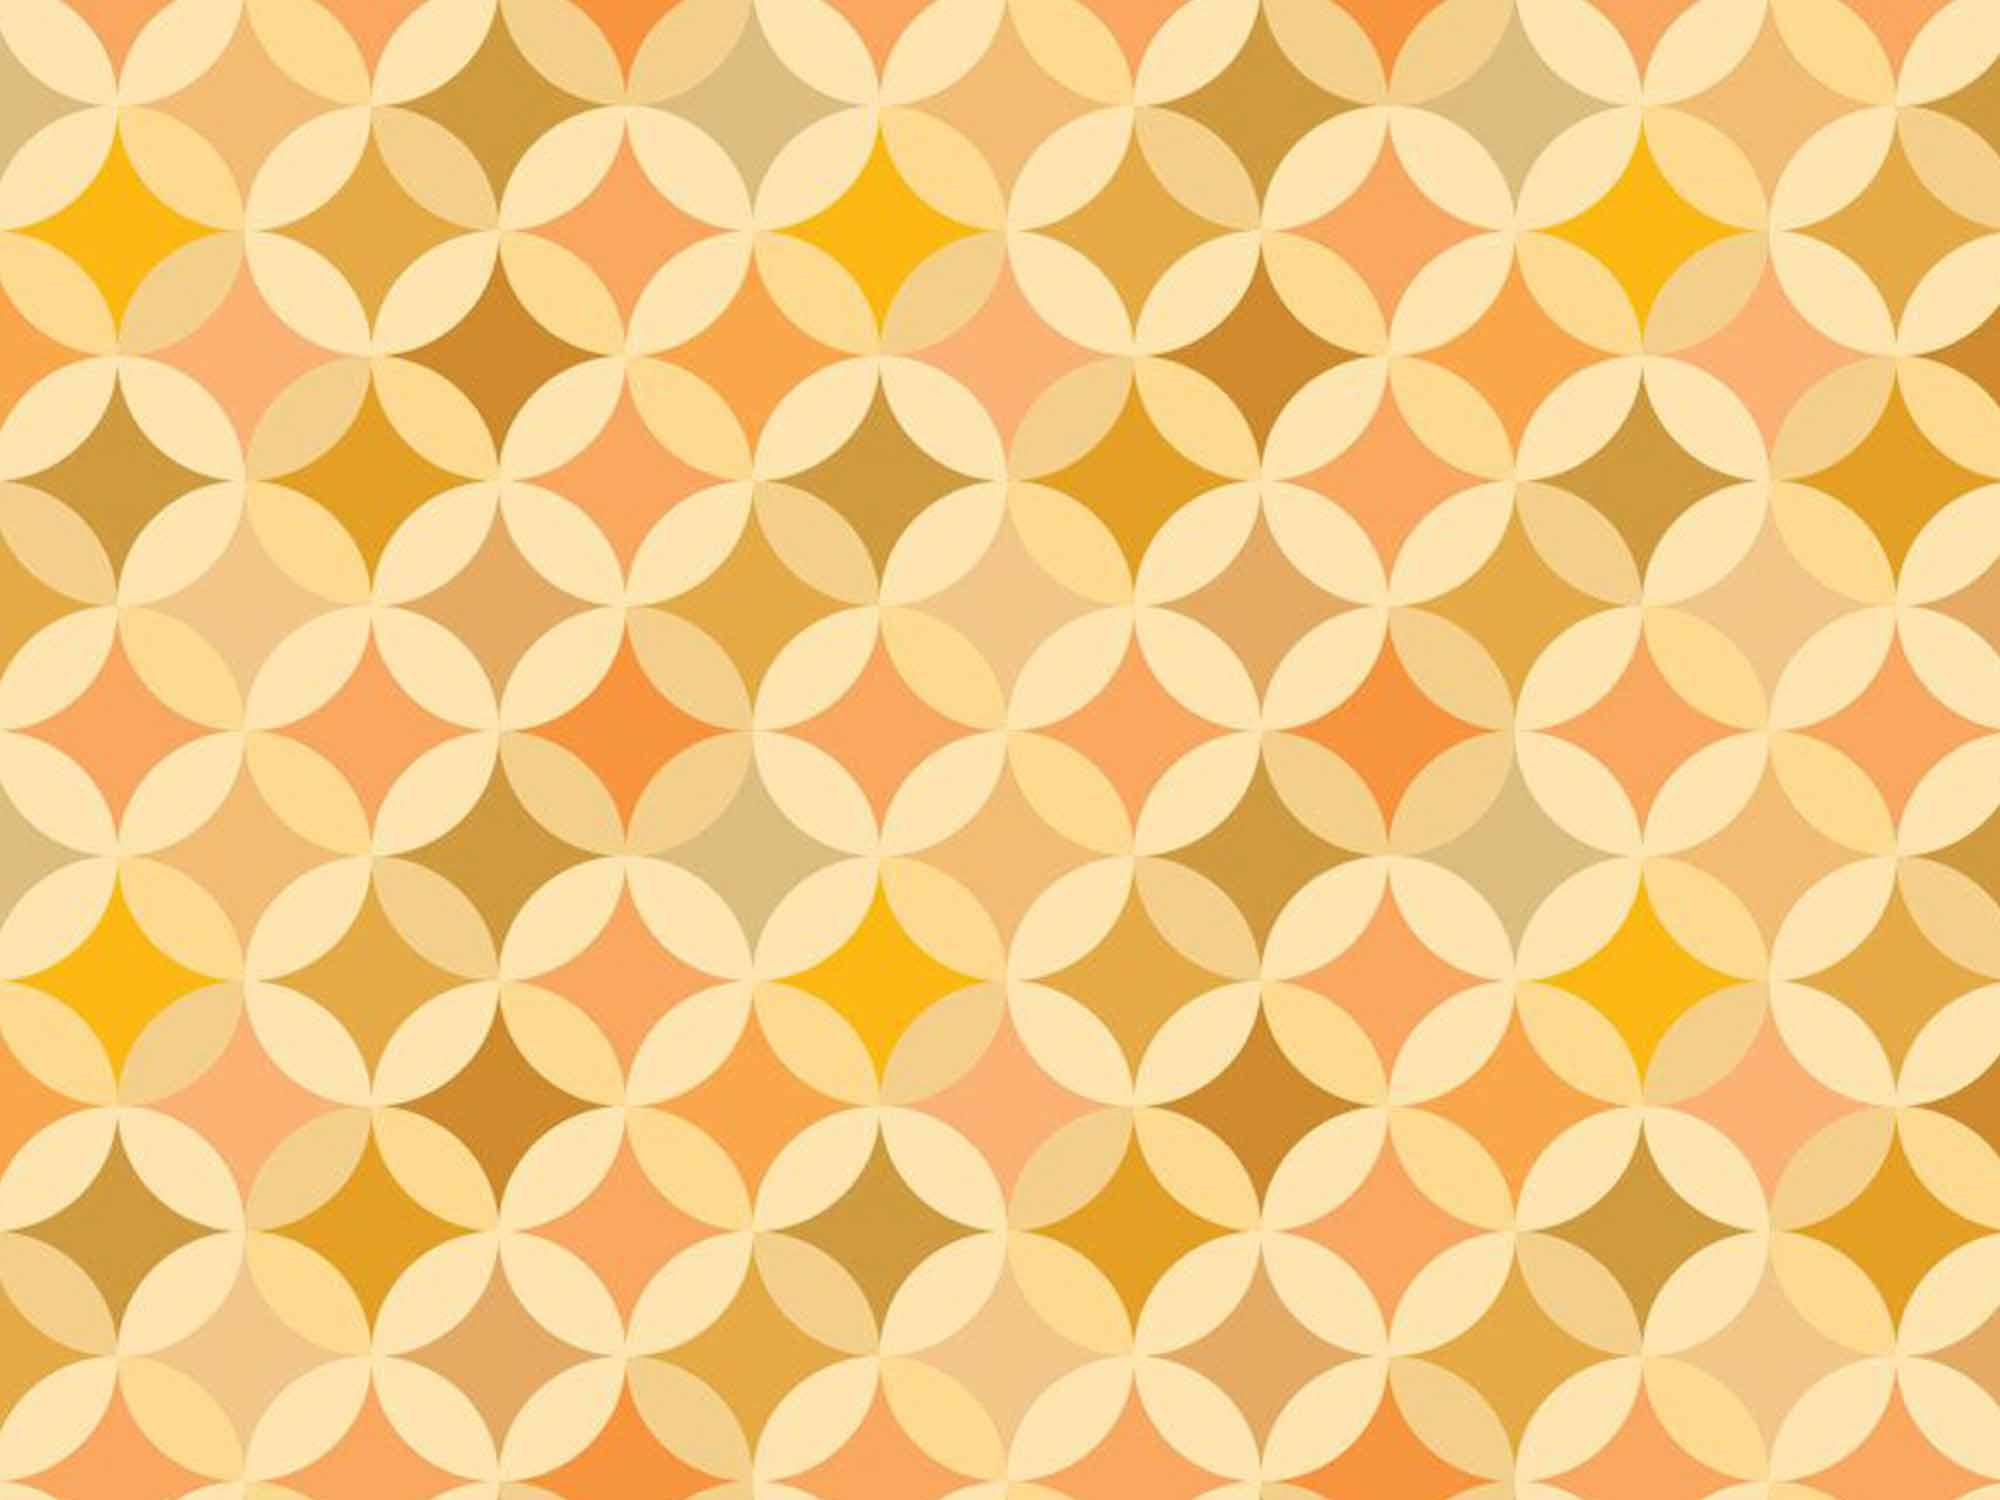 Papel de Parede para Sala Geométrico 0005 - Adesivos de Parede  - Paredes Decoradas